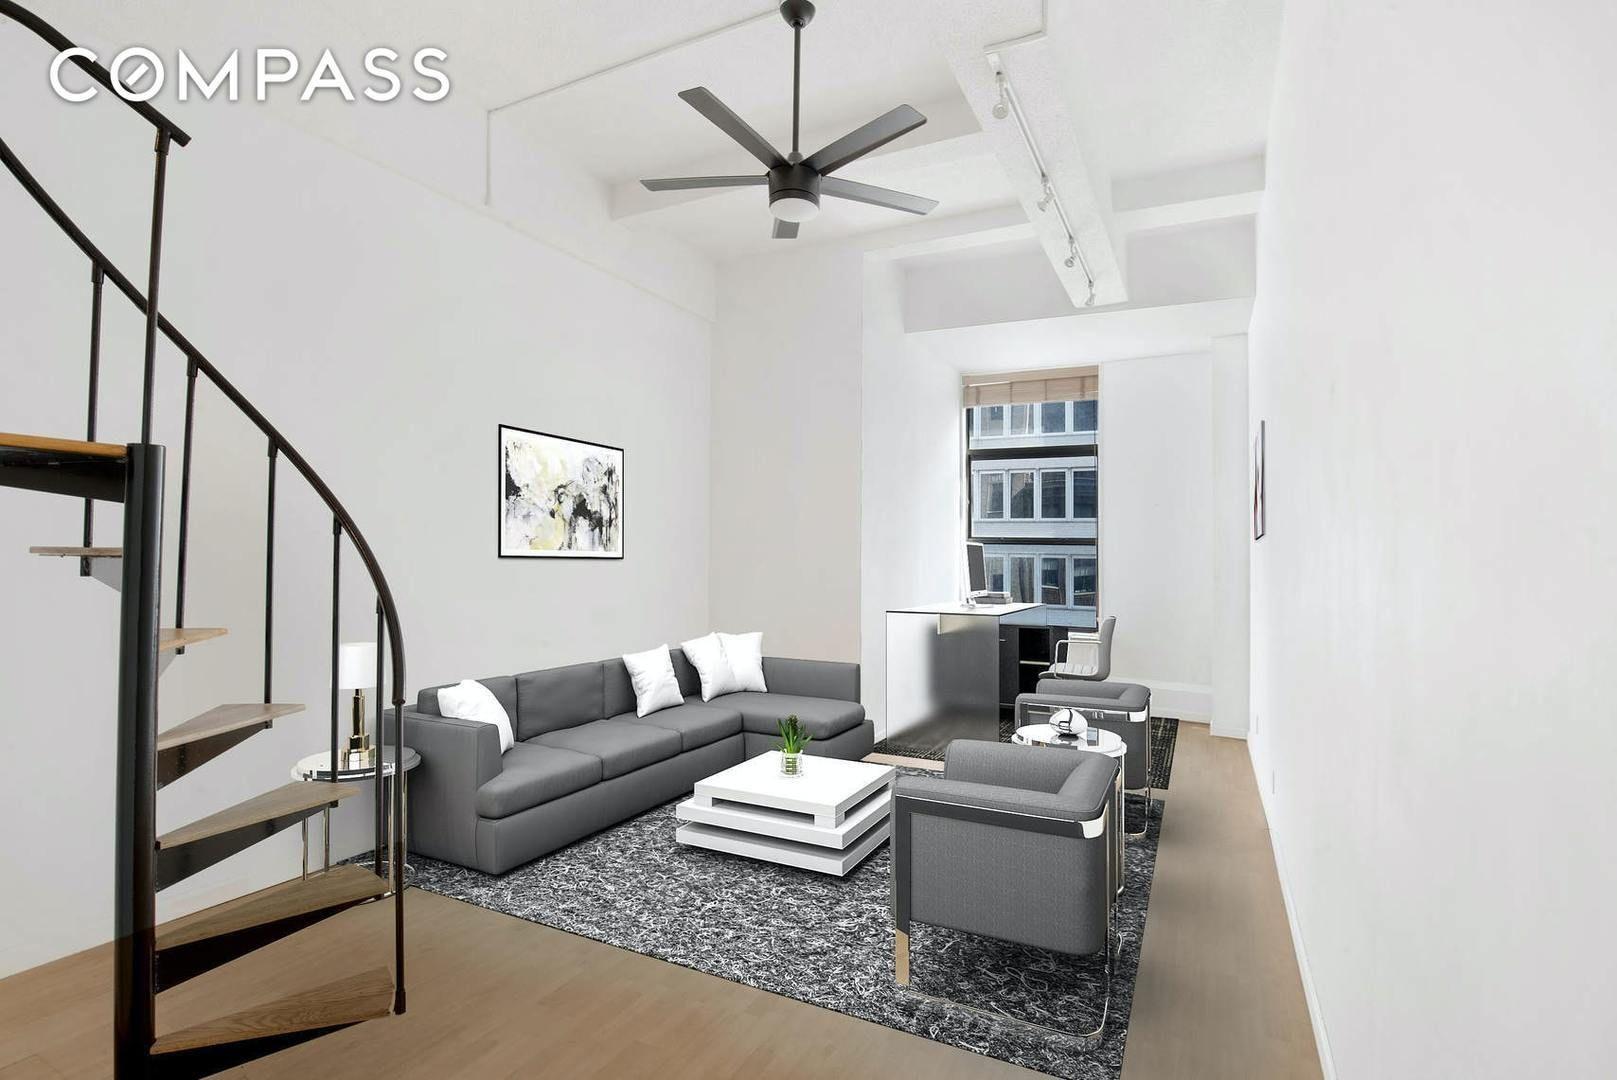 Apartment for sale at 244 Madison Avenue, Apt 10-C